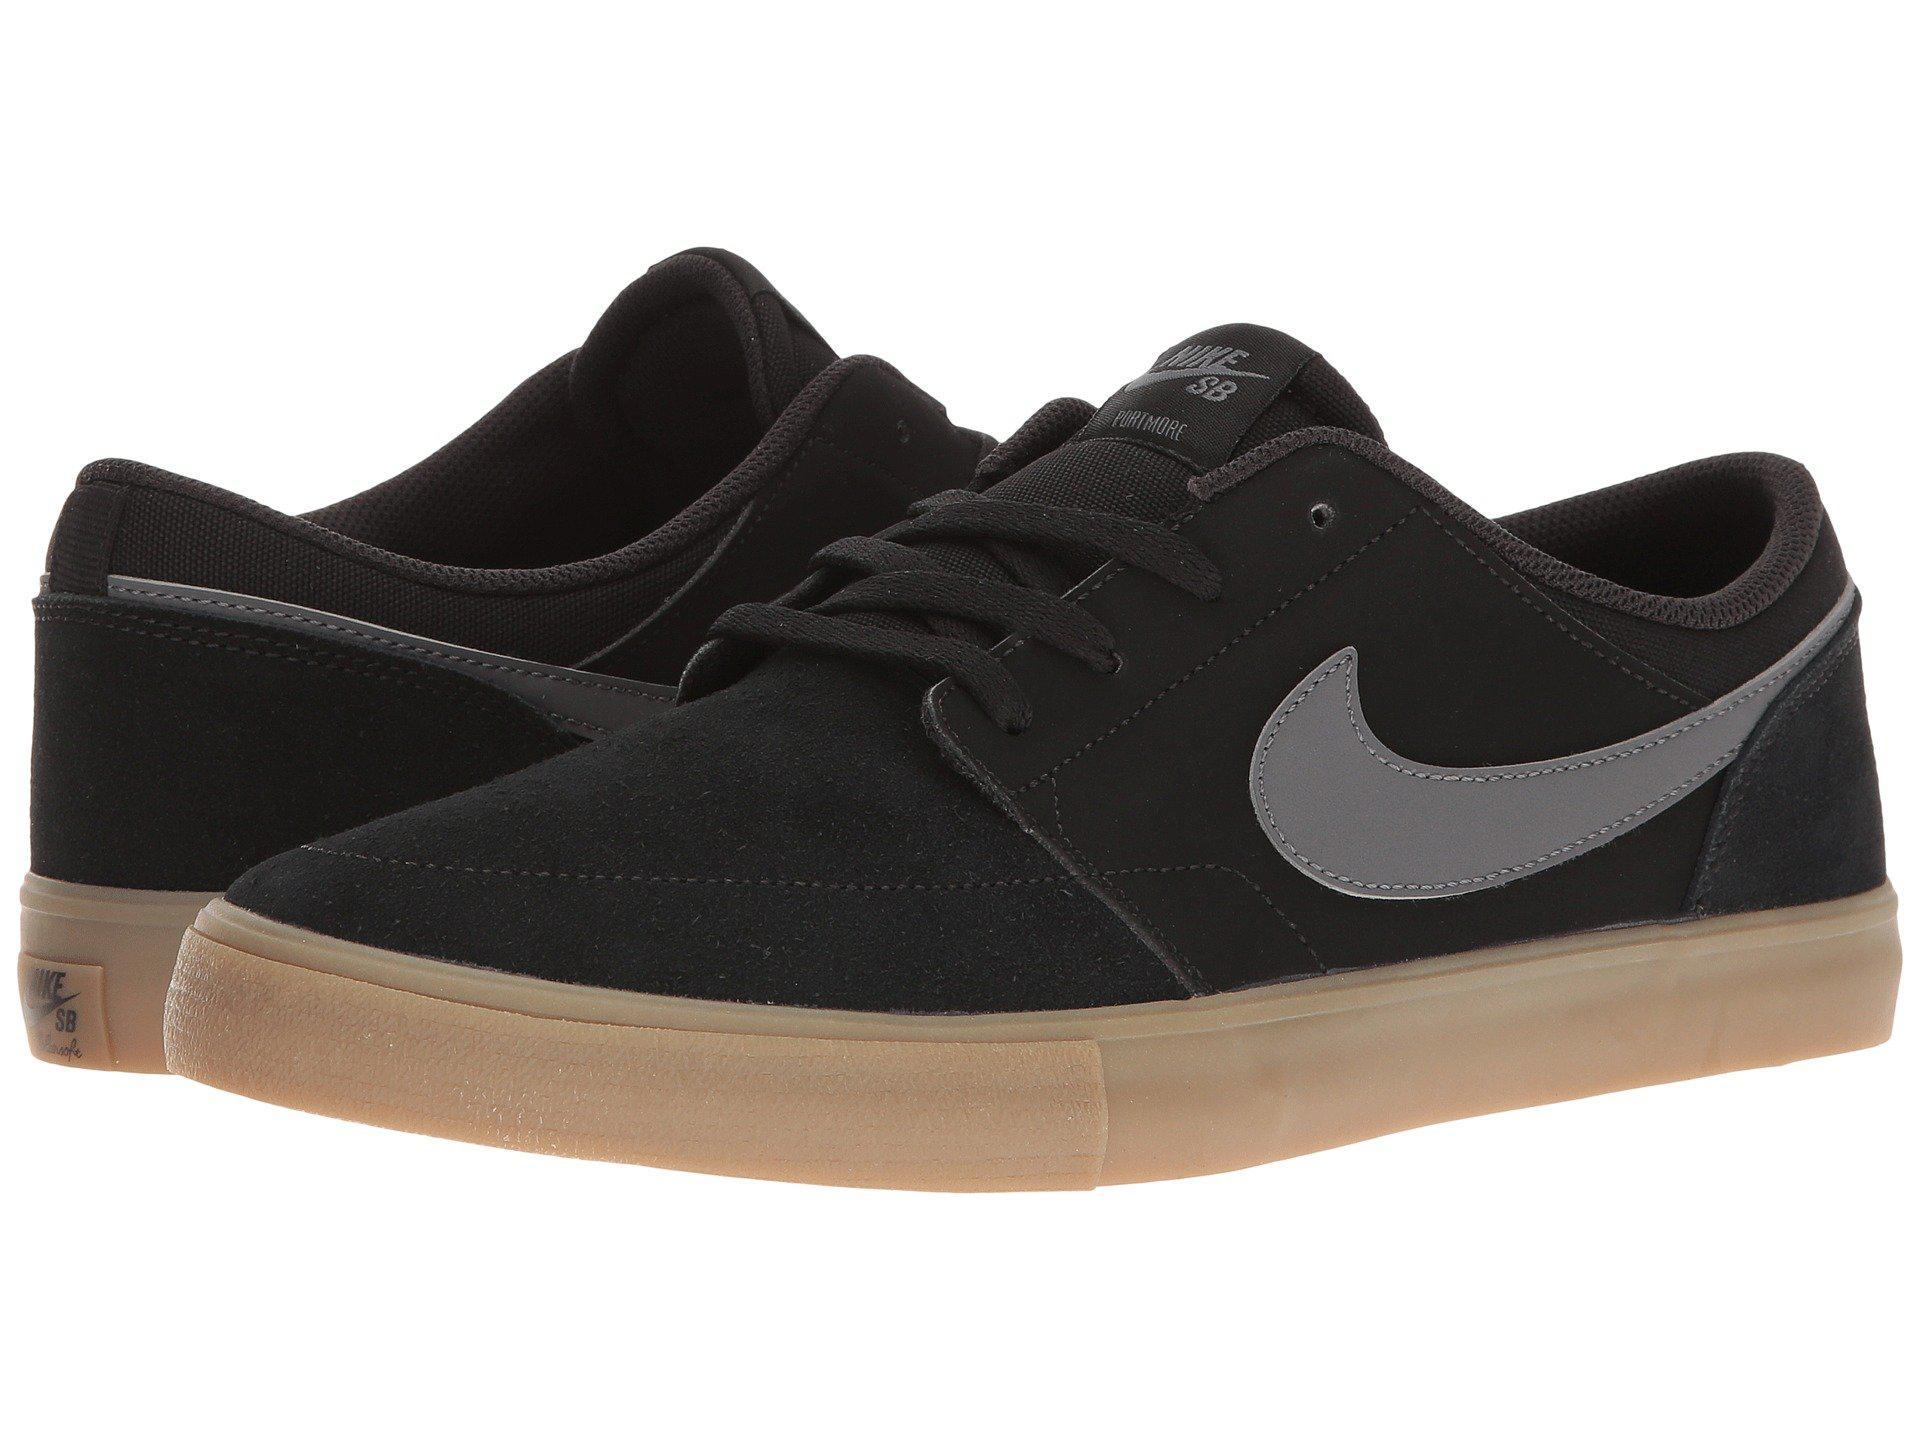 8ca17f7df17 Nike. Portmore Ii Solar - Suede (gunsmoke black white white) Men s Skate  Shoes